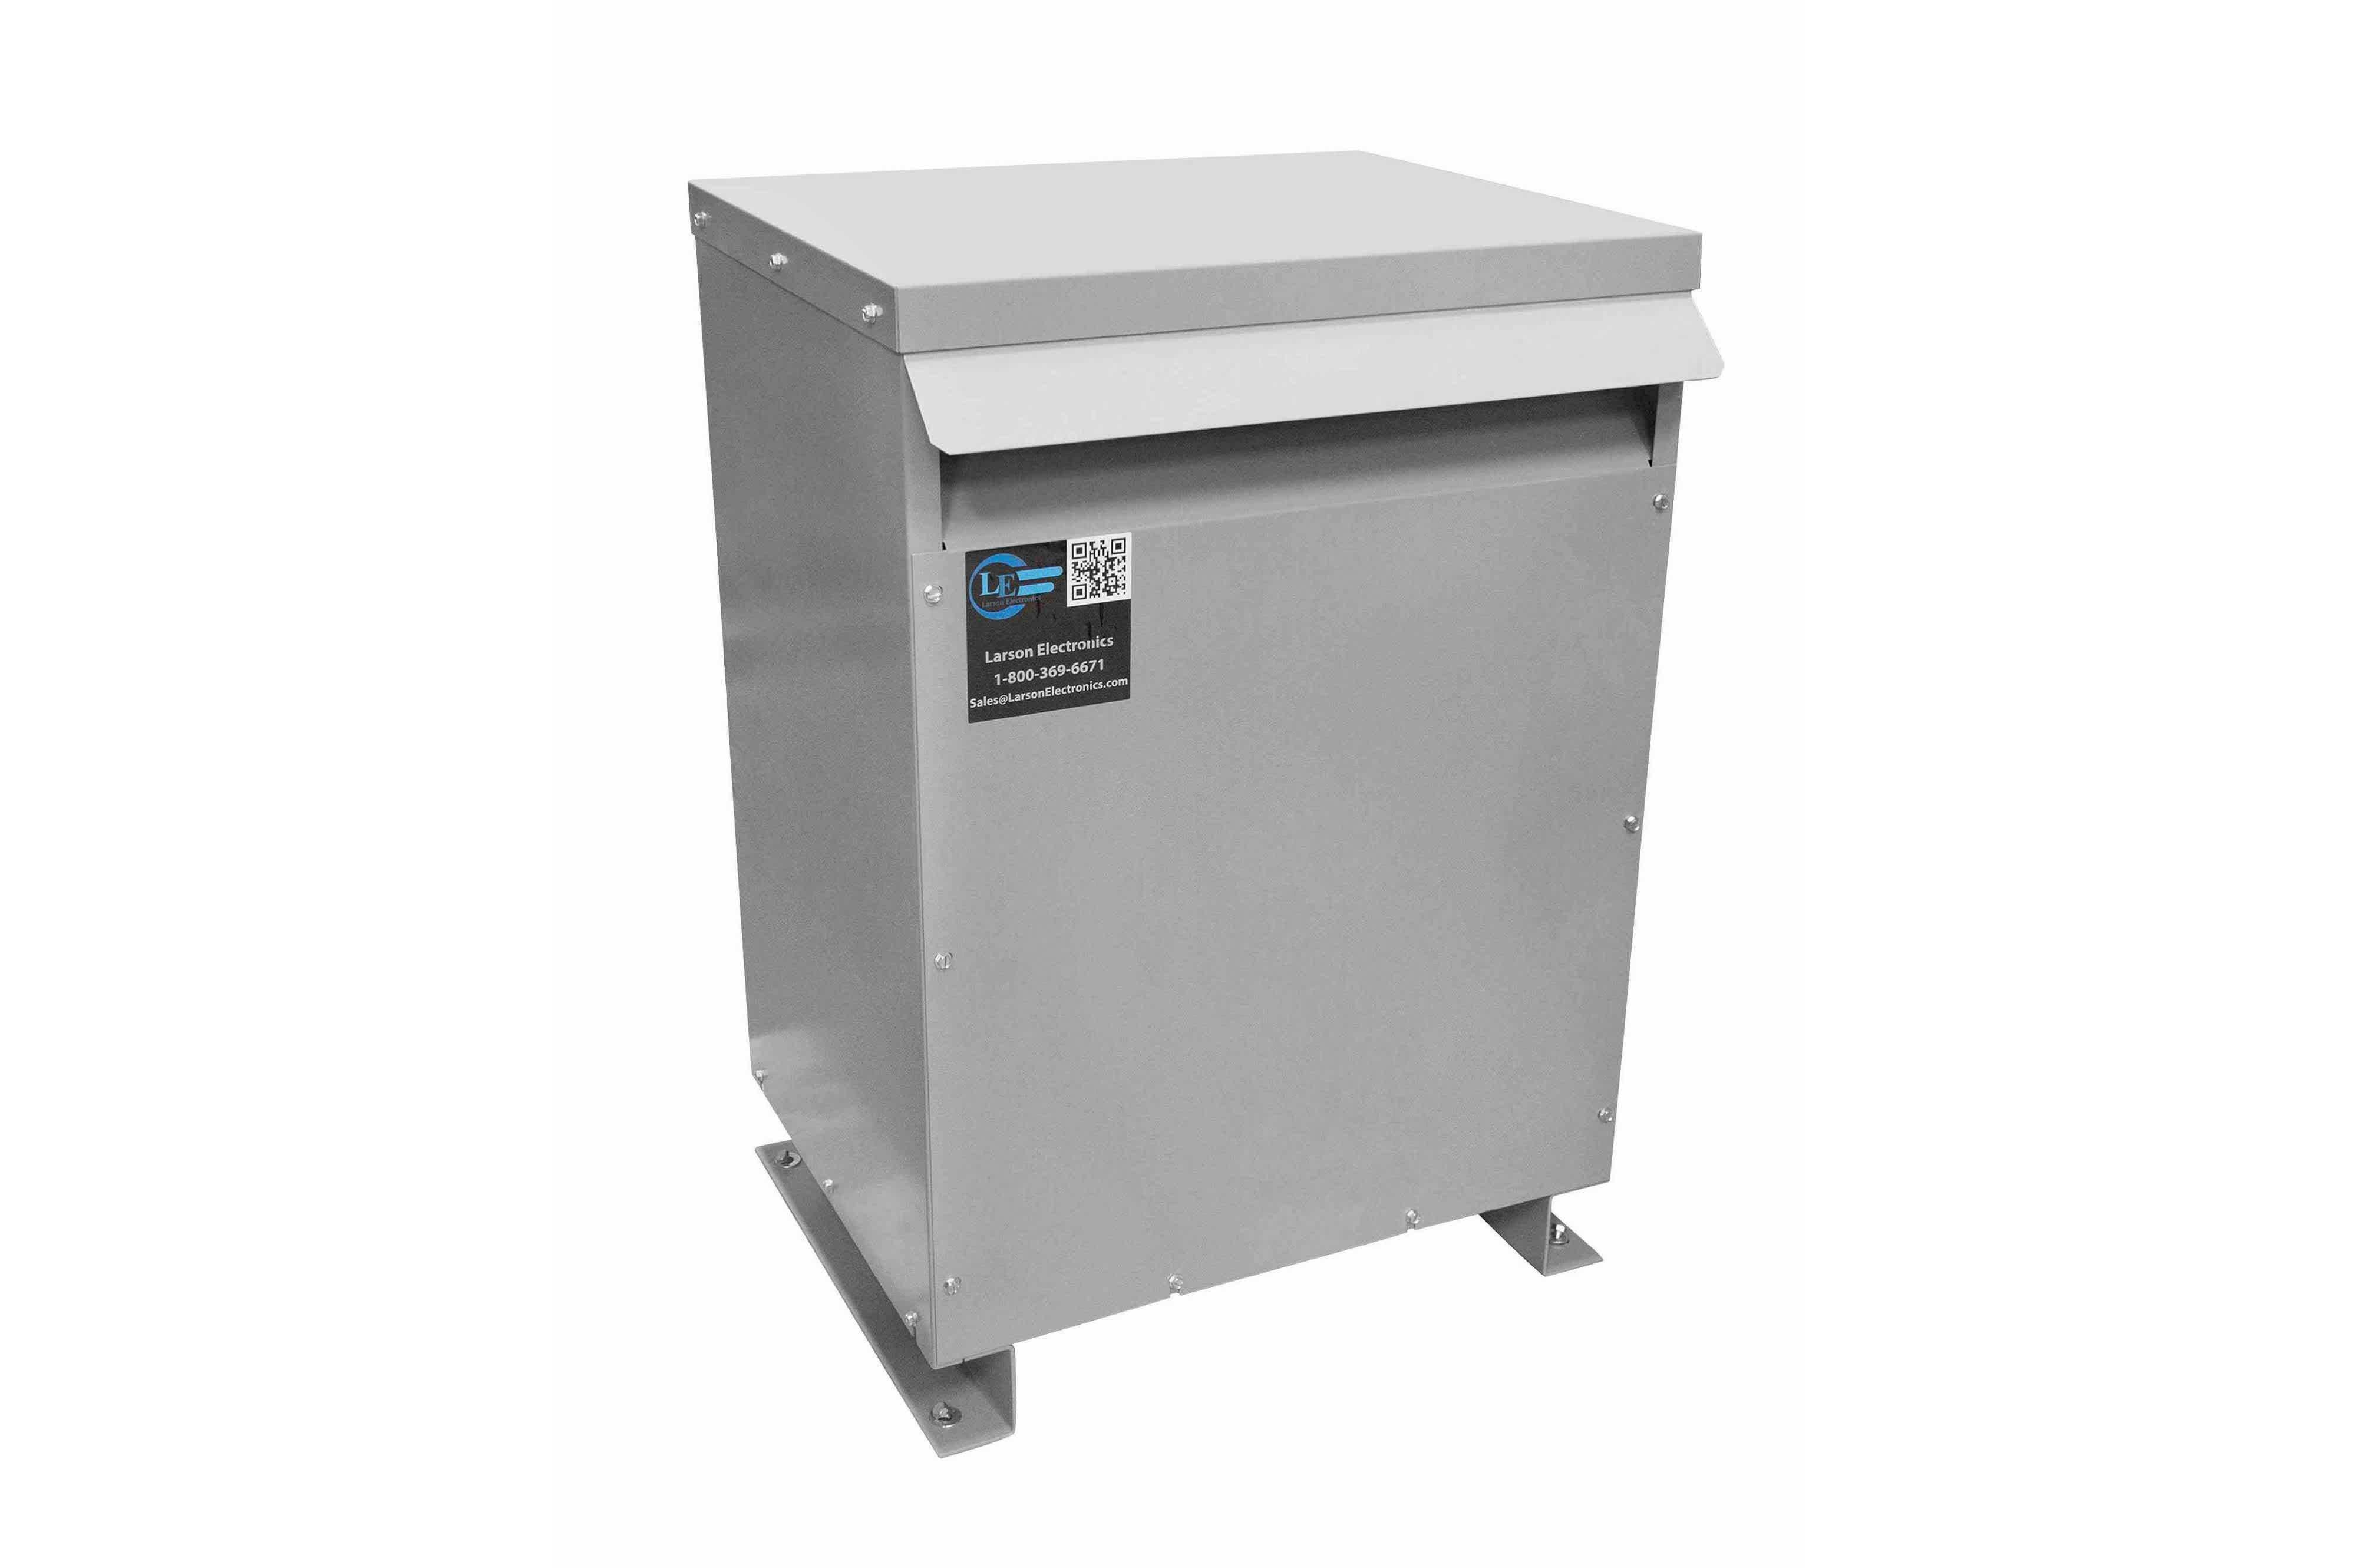 75 kVA 3PH DOE Transformer, 600V Delta Primary, 415Y/240 Wye-N Secondary, N3R, Ventilated, 60 Hz